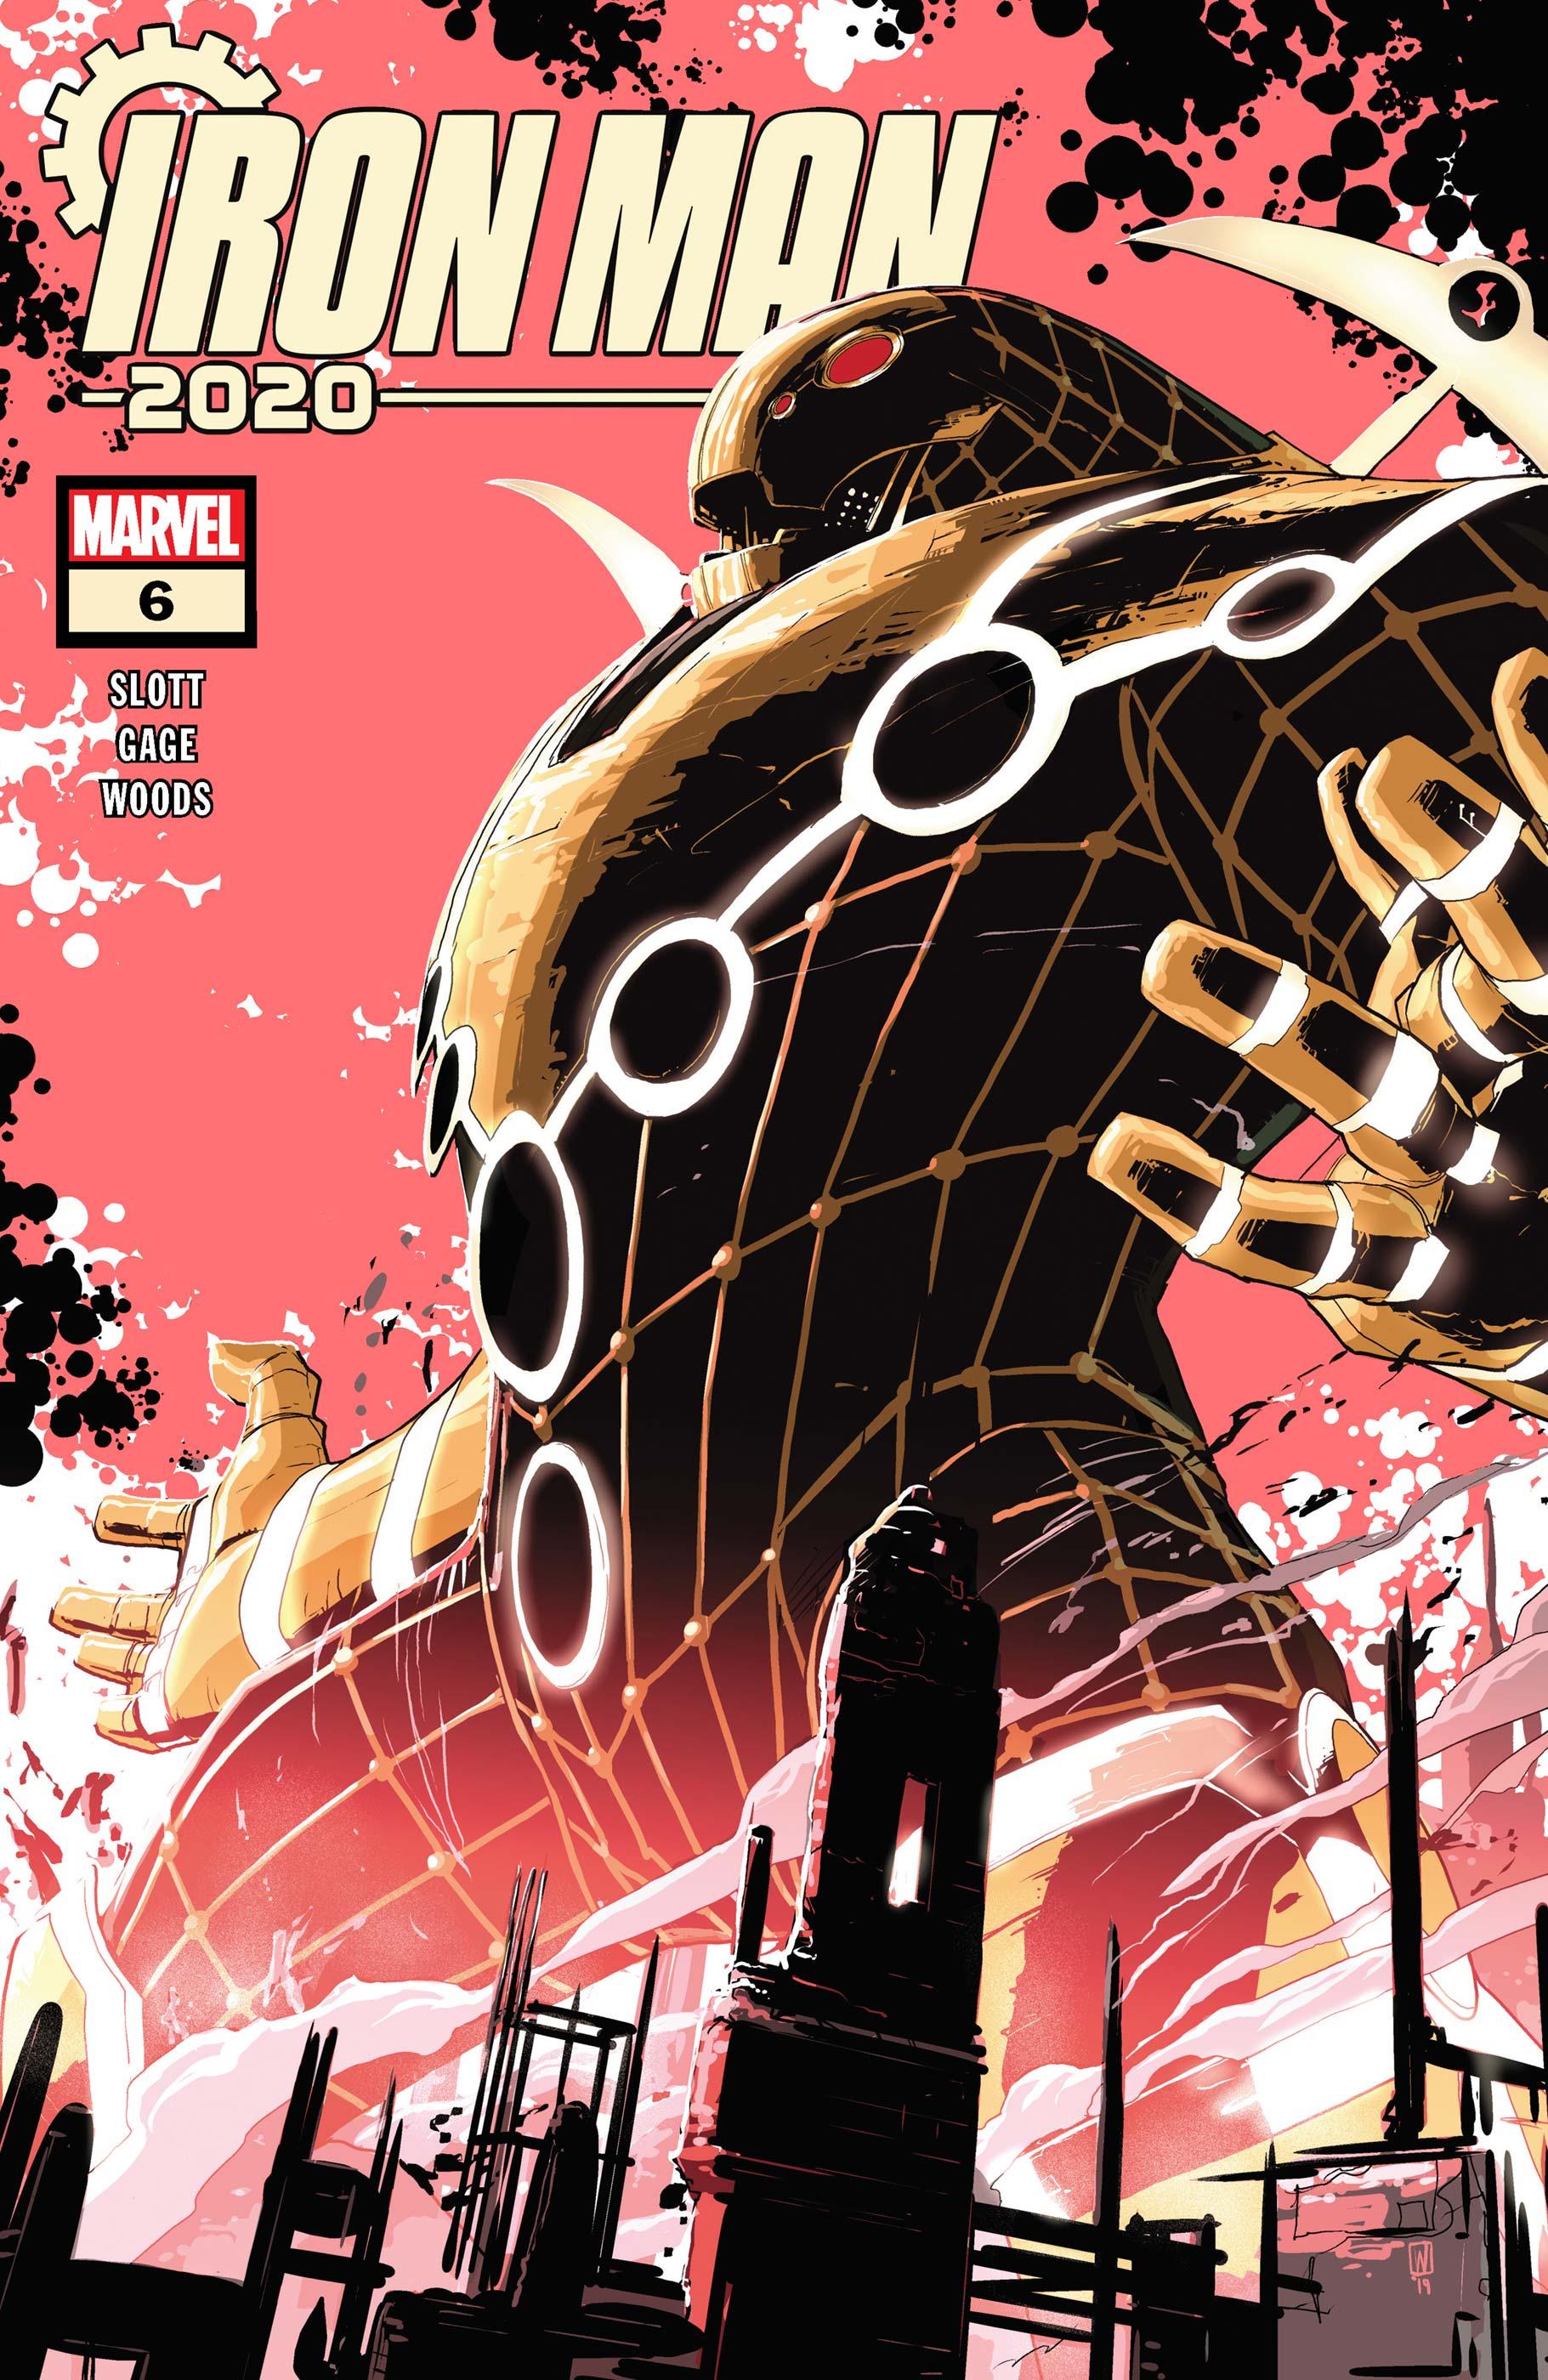 Iron Man 2020 (2020) #6